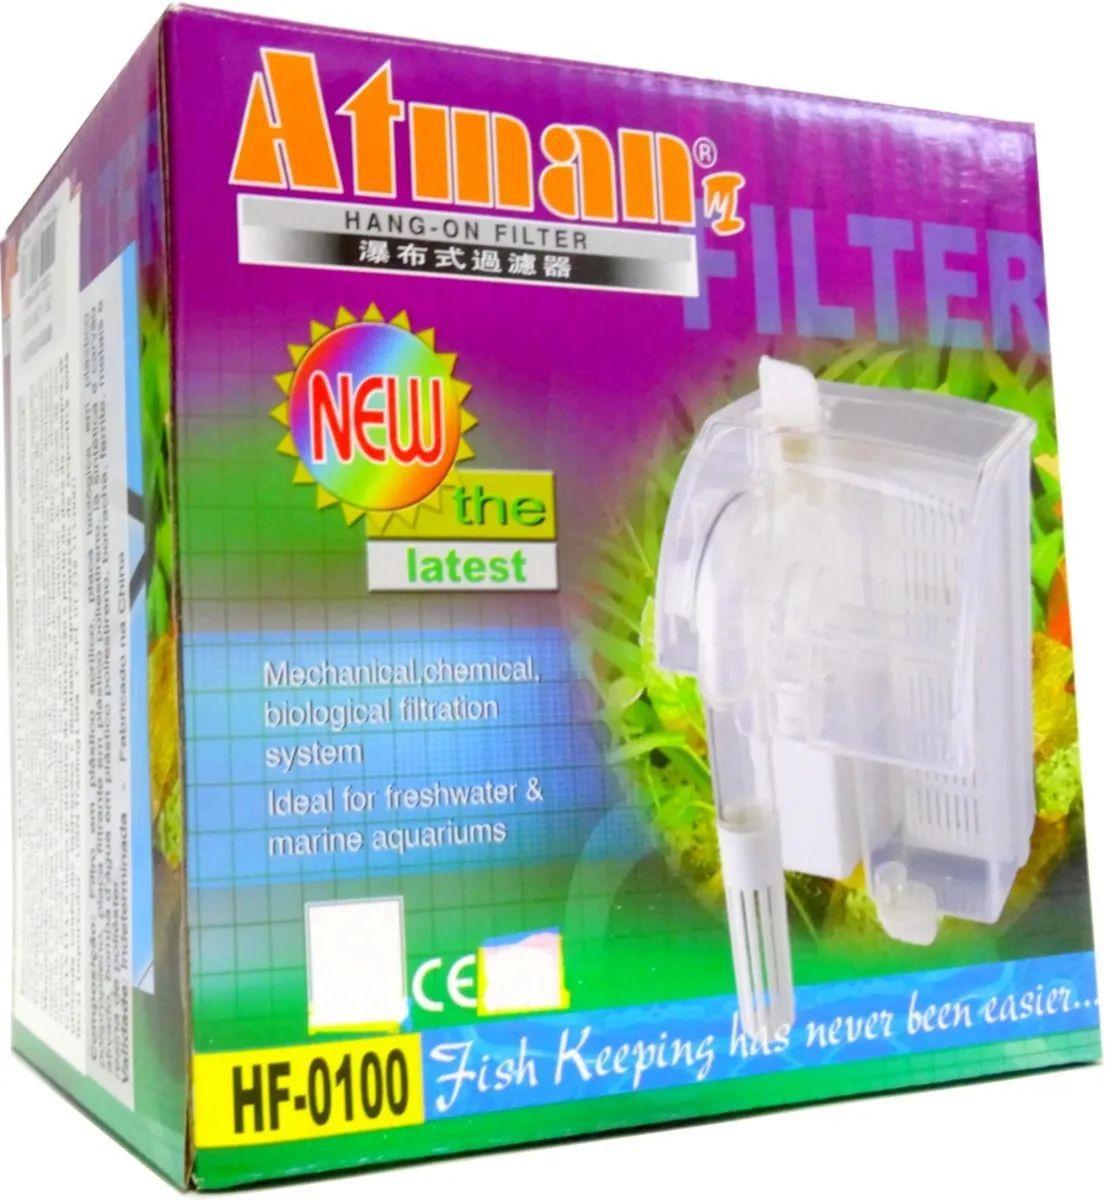 Filtro externo para Aquario Atman Hf - 0100 160 L/h 110v